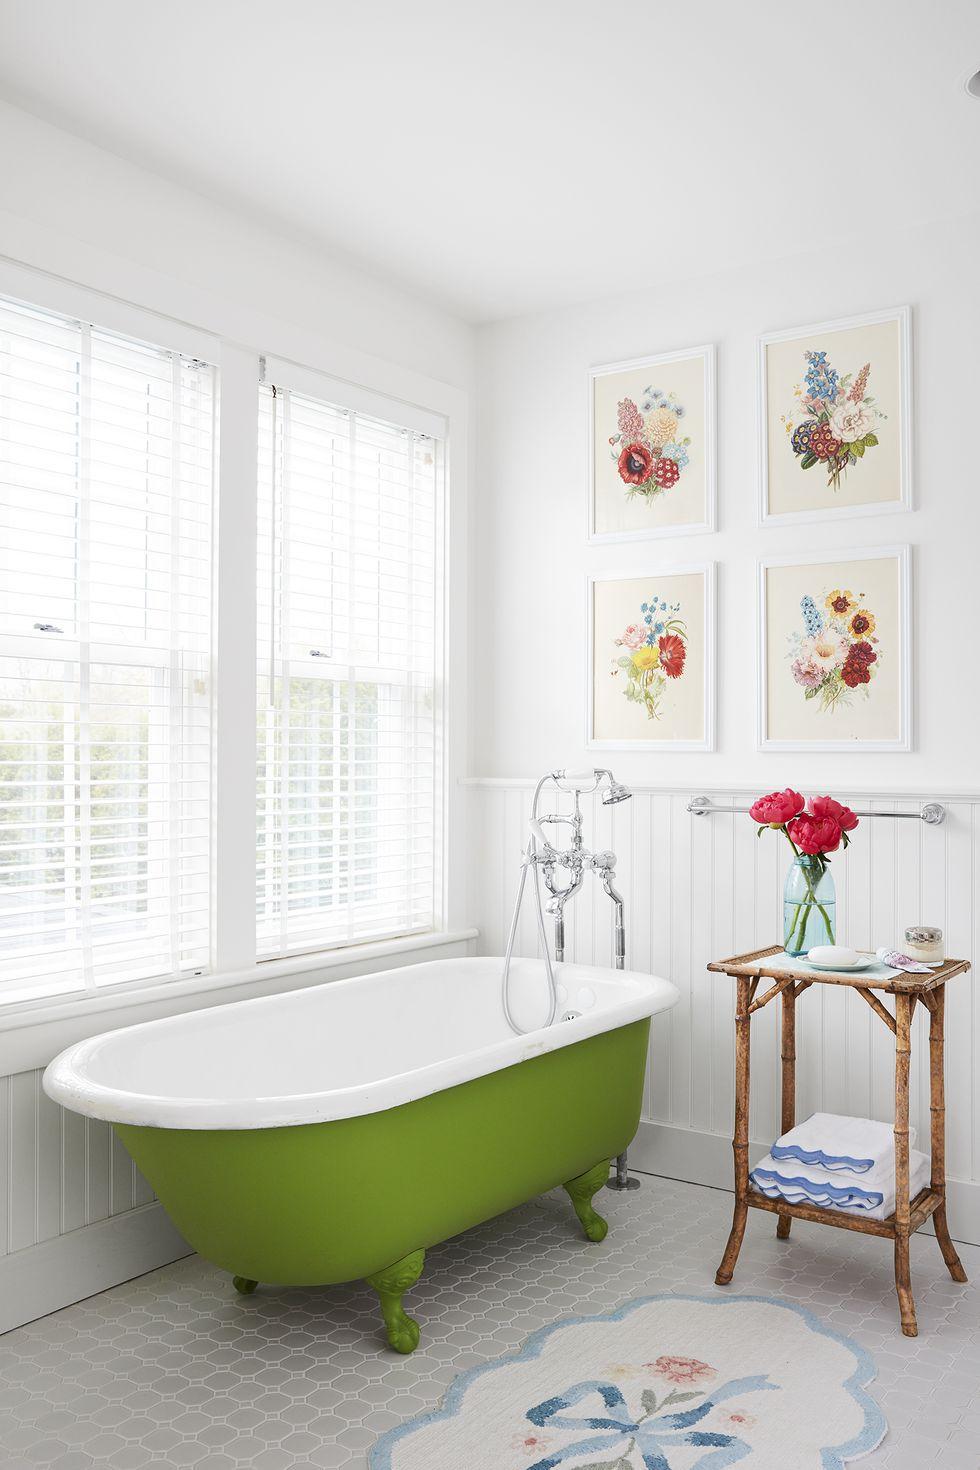 Furniture Ideas For Bathroom Faucet